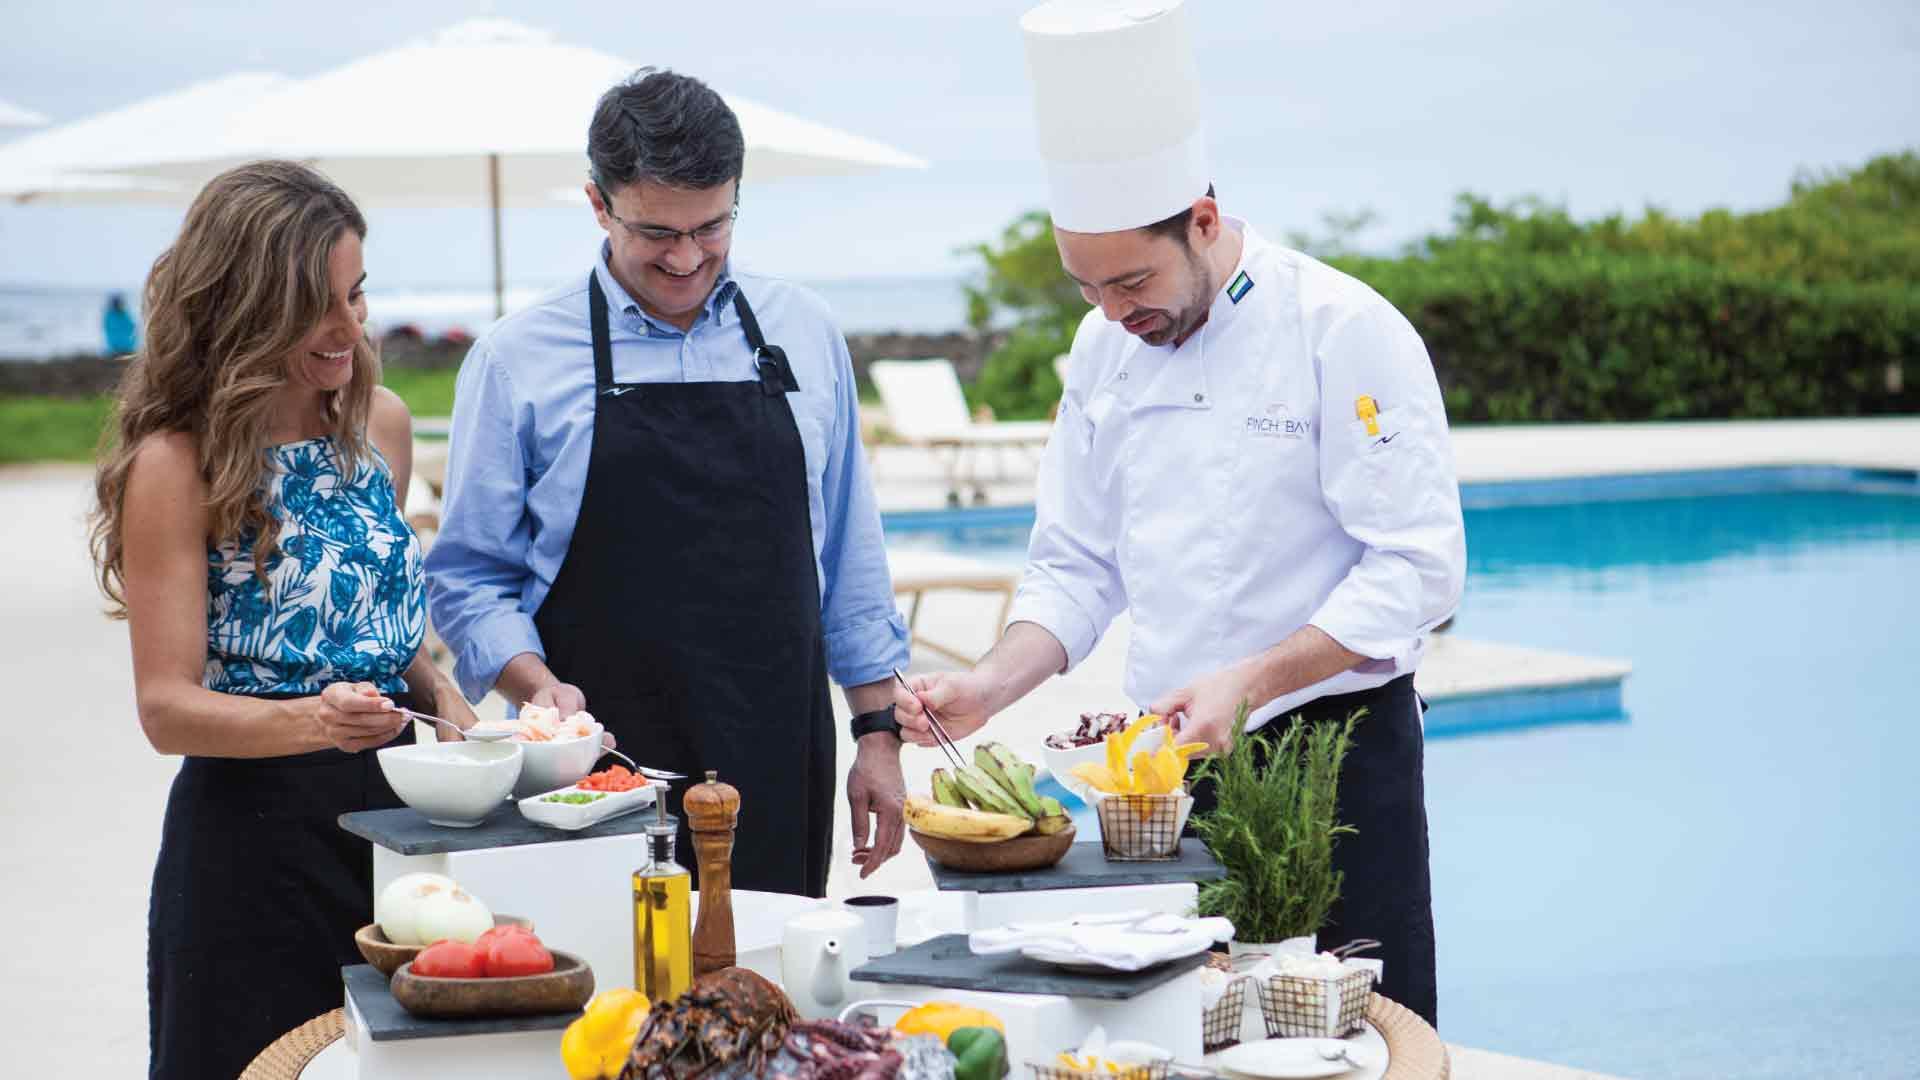 chef serving breakfast at finch bay hotel sant cruz iusland